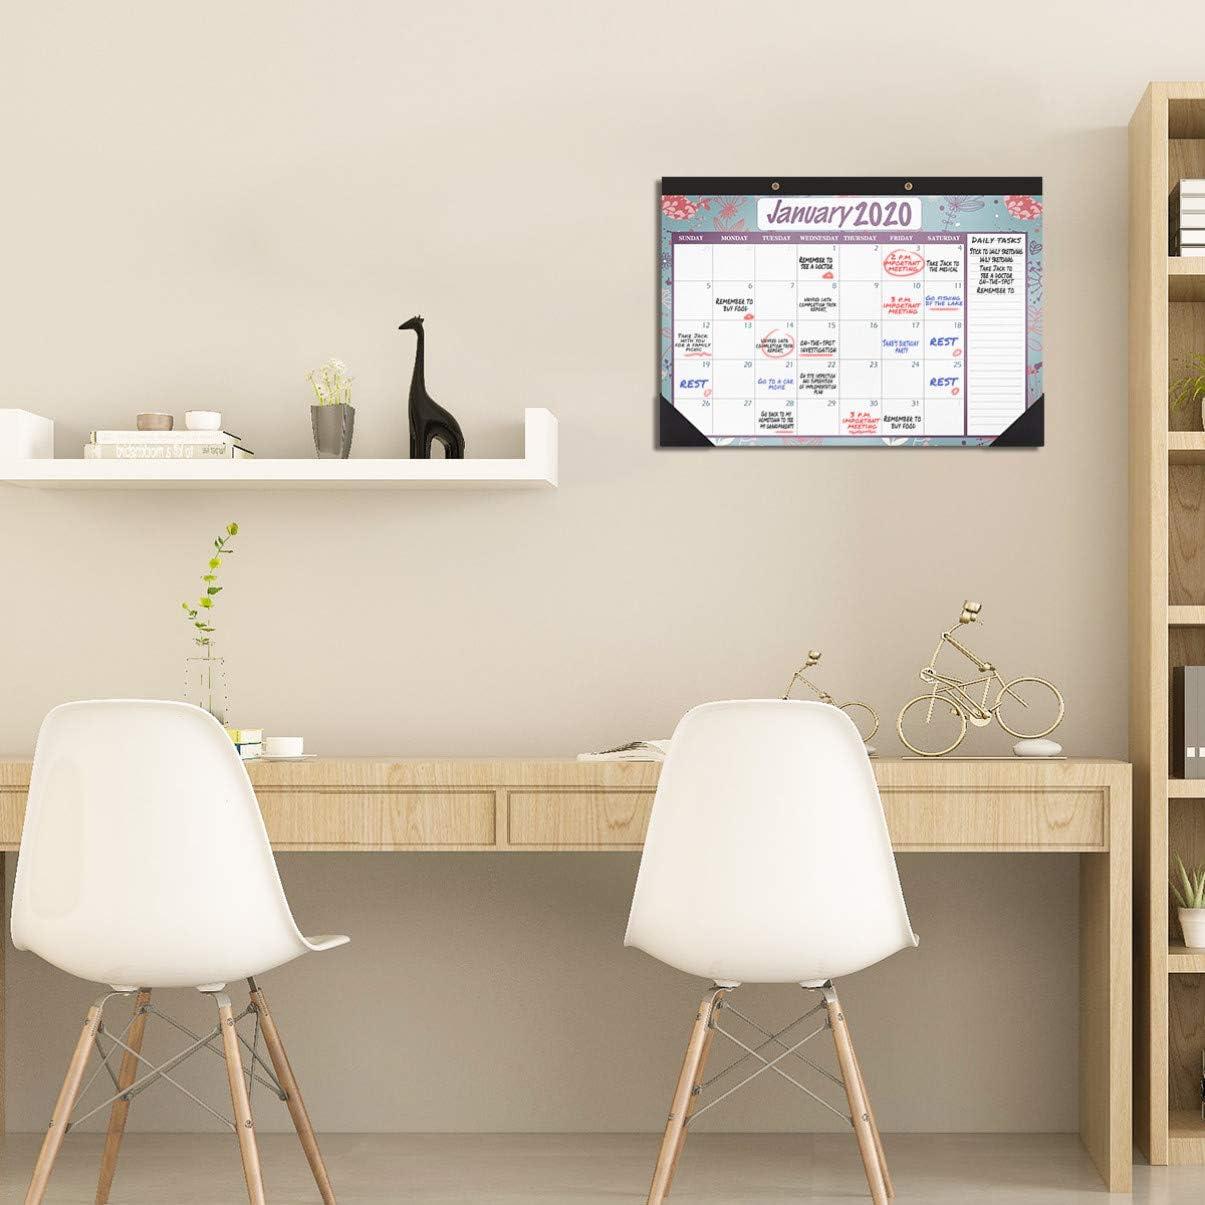 STOBOK 2020-2021 Year Monthly Desk Pad Calendar Desktop Wall Calendar for Office Home Daily Schedule Planner